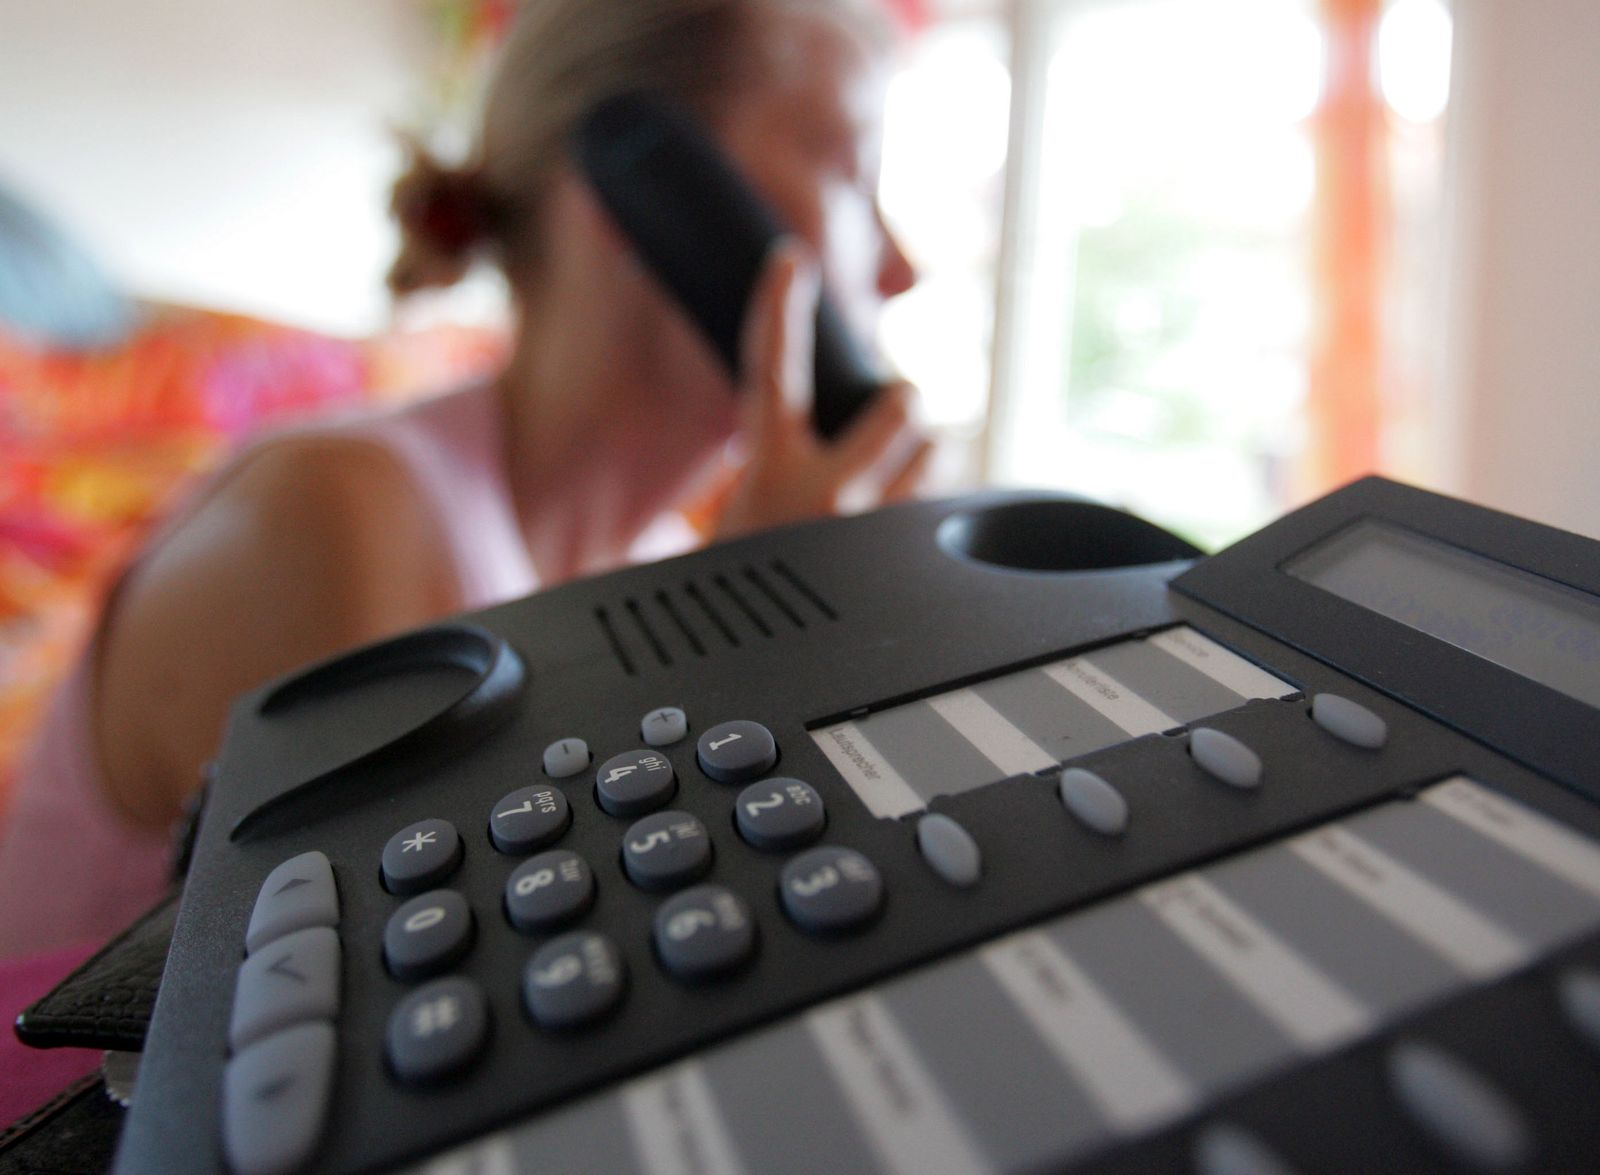 Telefon-Abzocke / Warteschleife